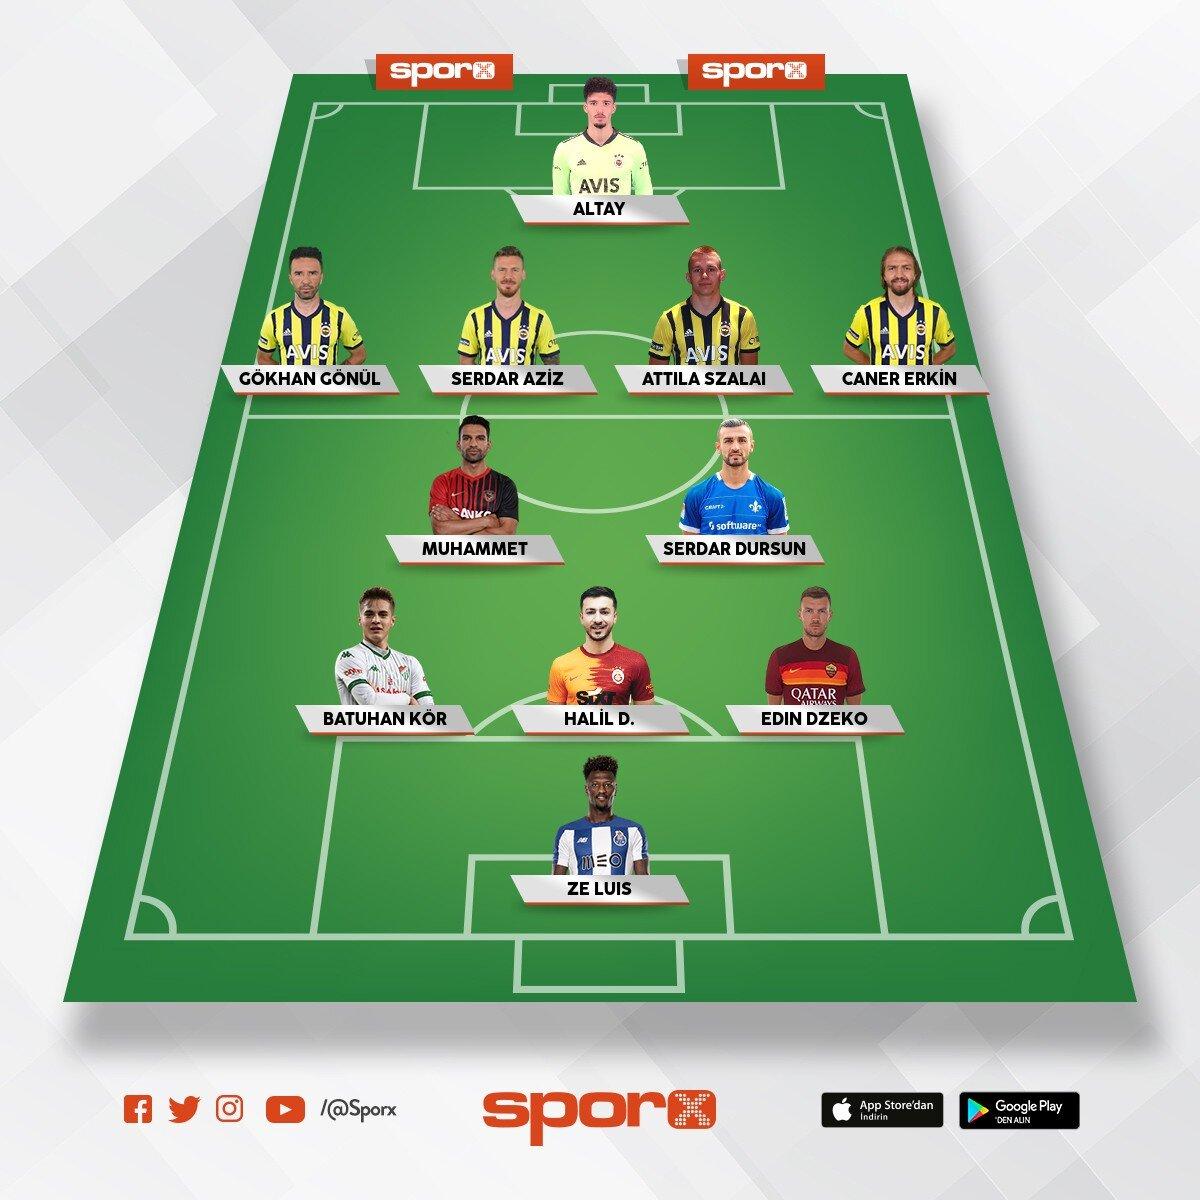 fb transfer listesindeki oyuncular part3